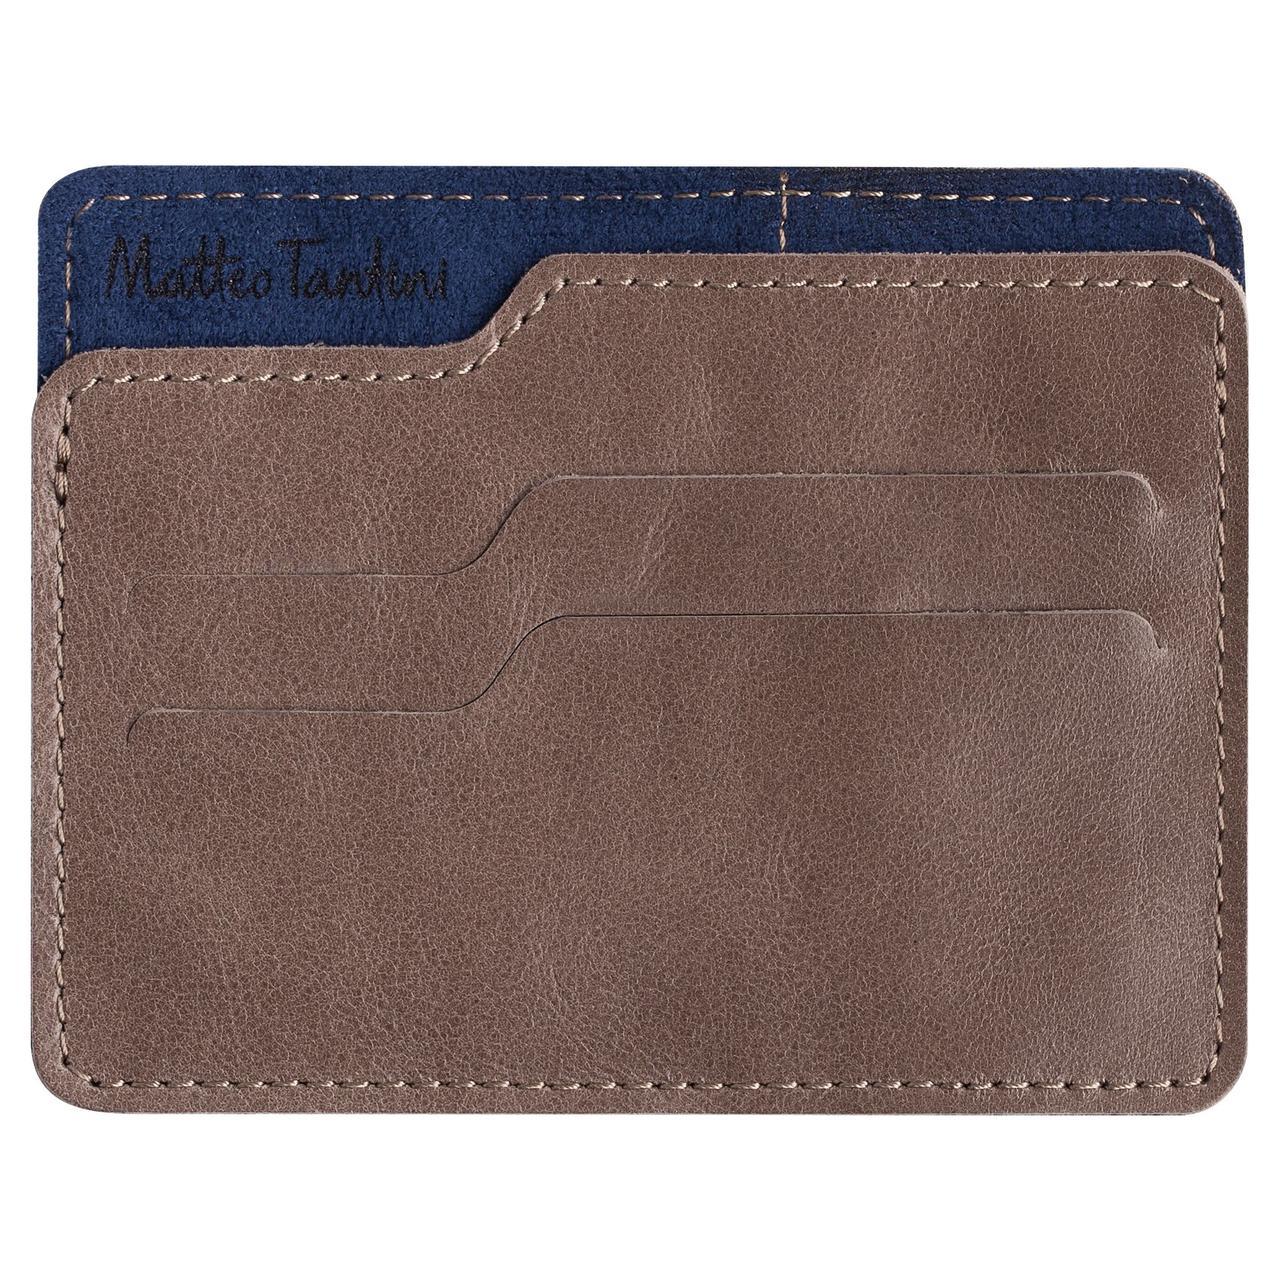 Чехол для карточек Roma, коричнево-синий